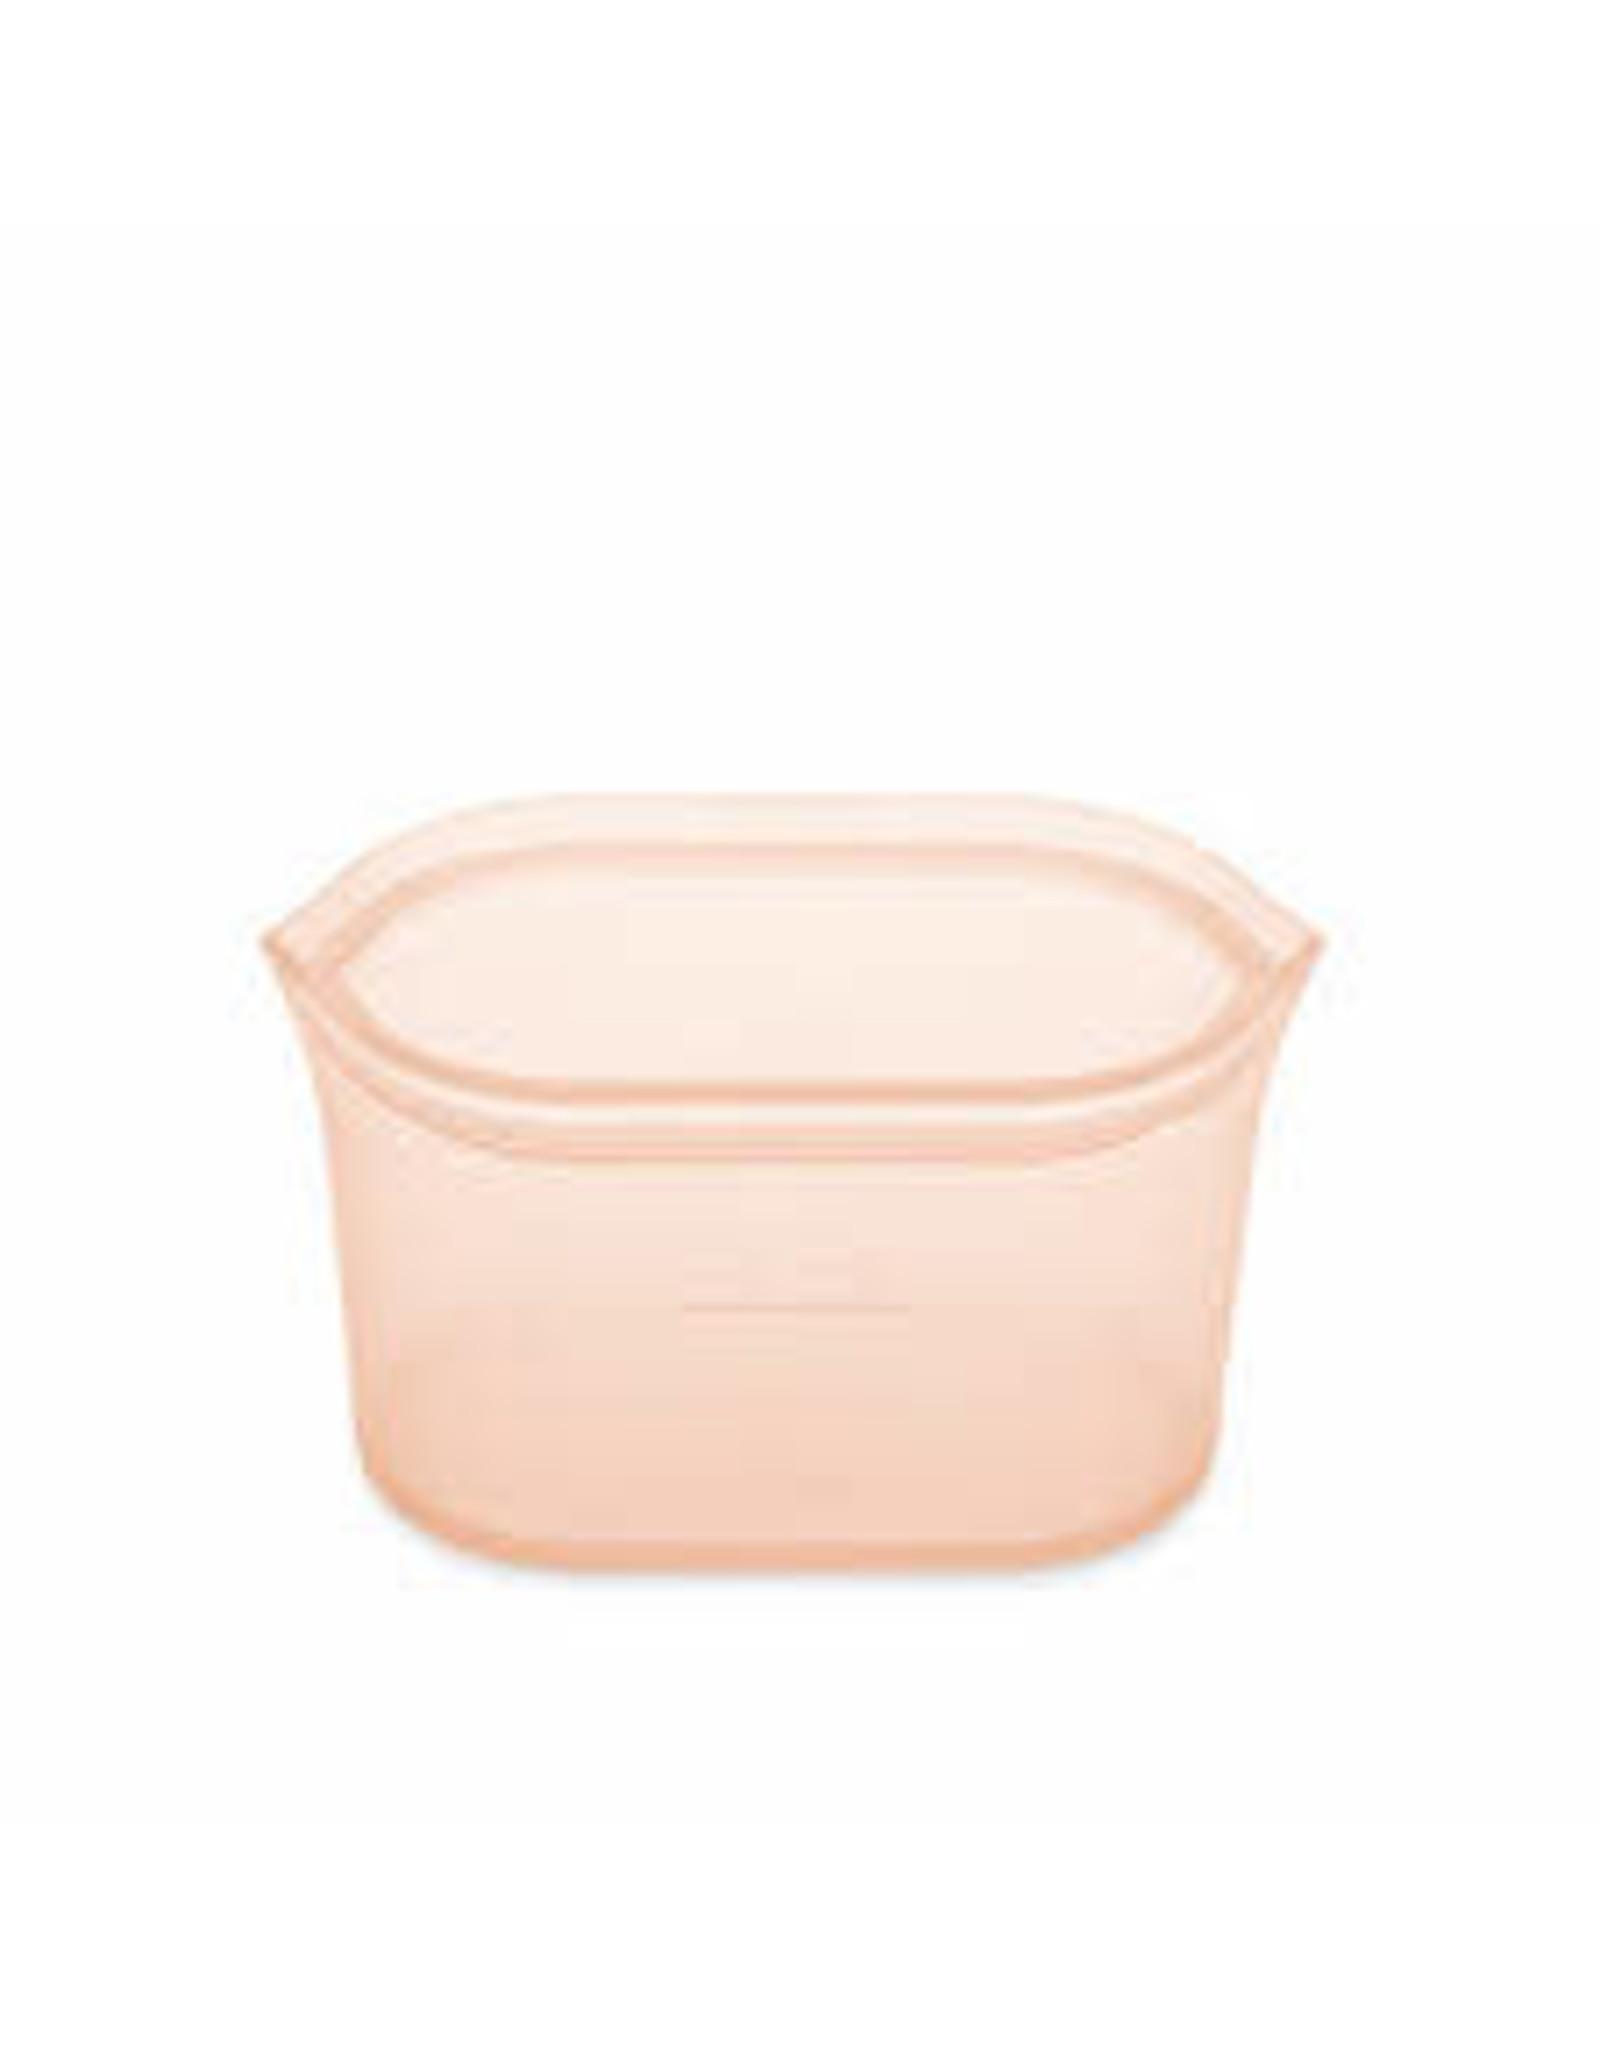 Ziptop Zip Top - Small Dish - Peach